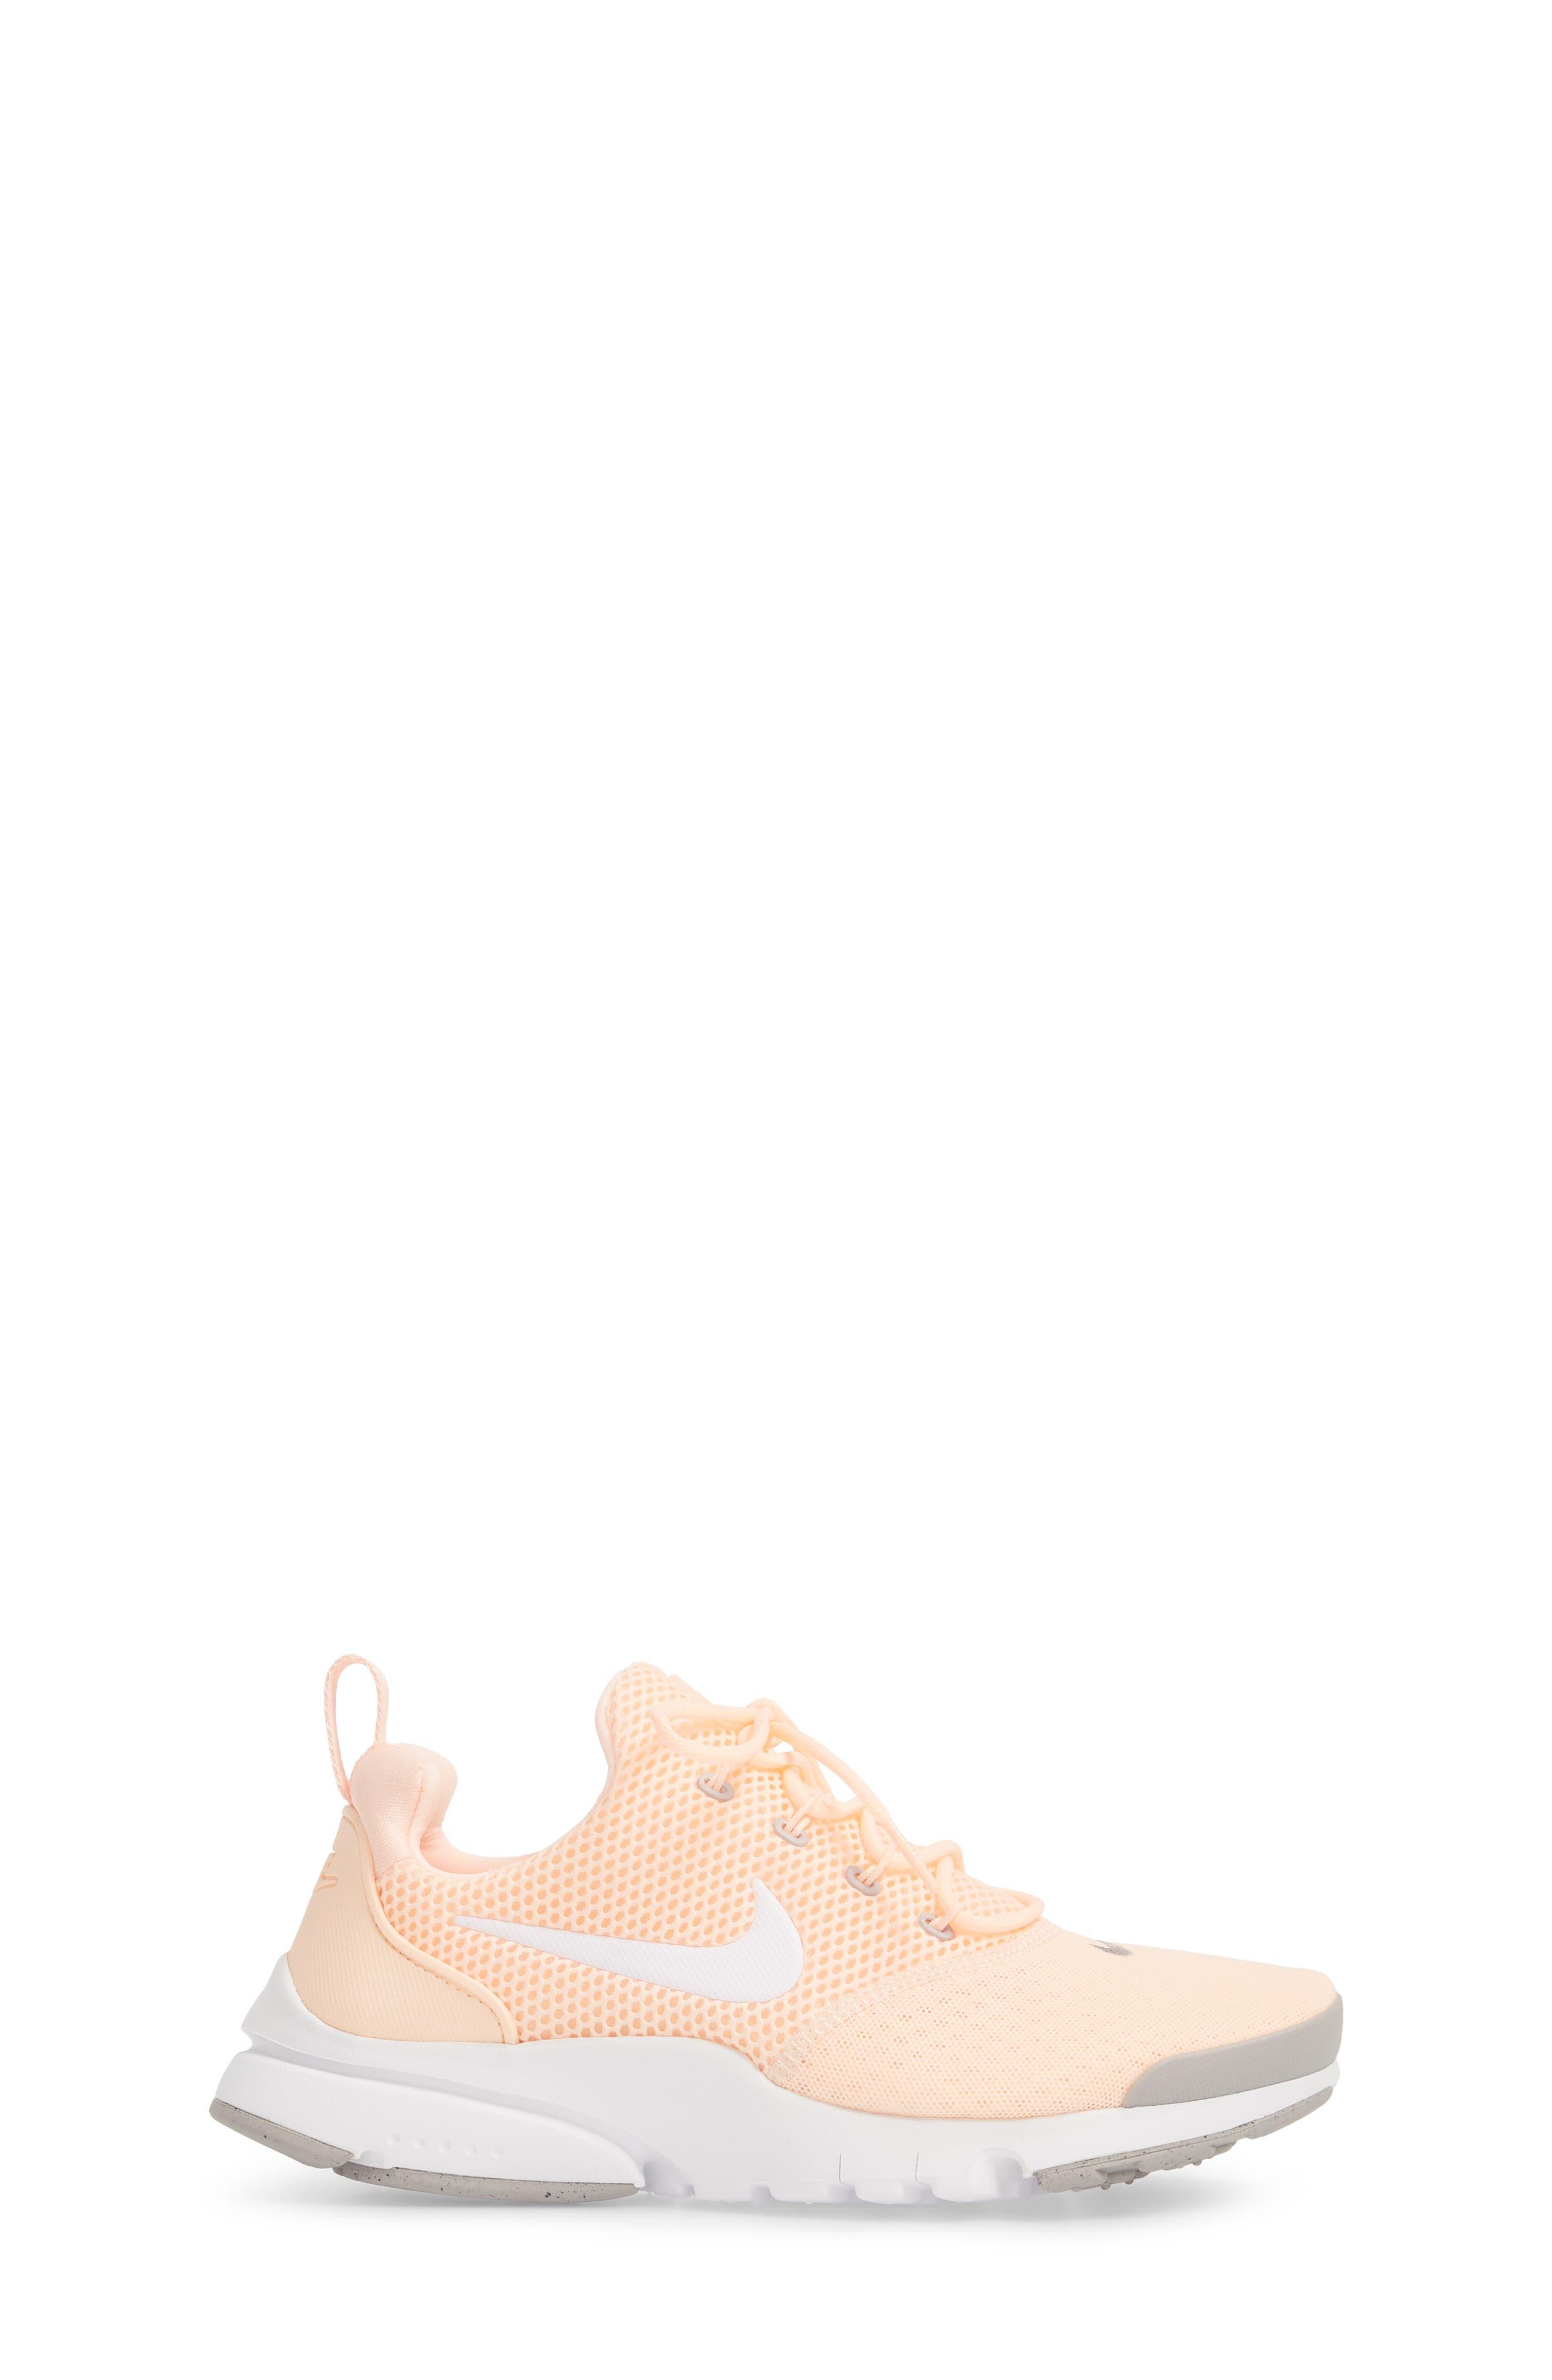 Presto Fly Sneaker,                             Alternate thumbnail 4, color,                             Crimson Tint/ White/ Grey